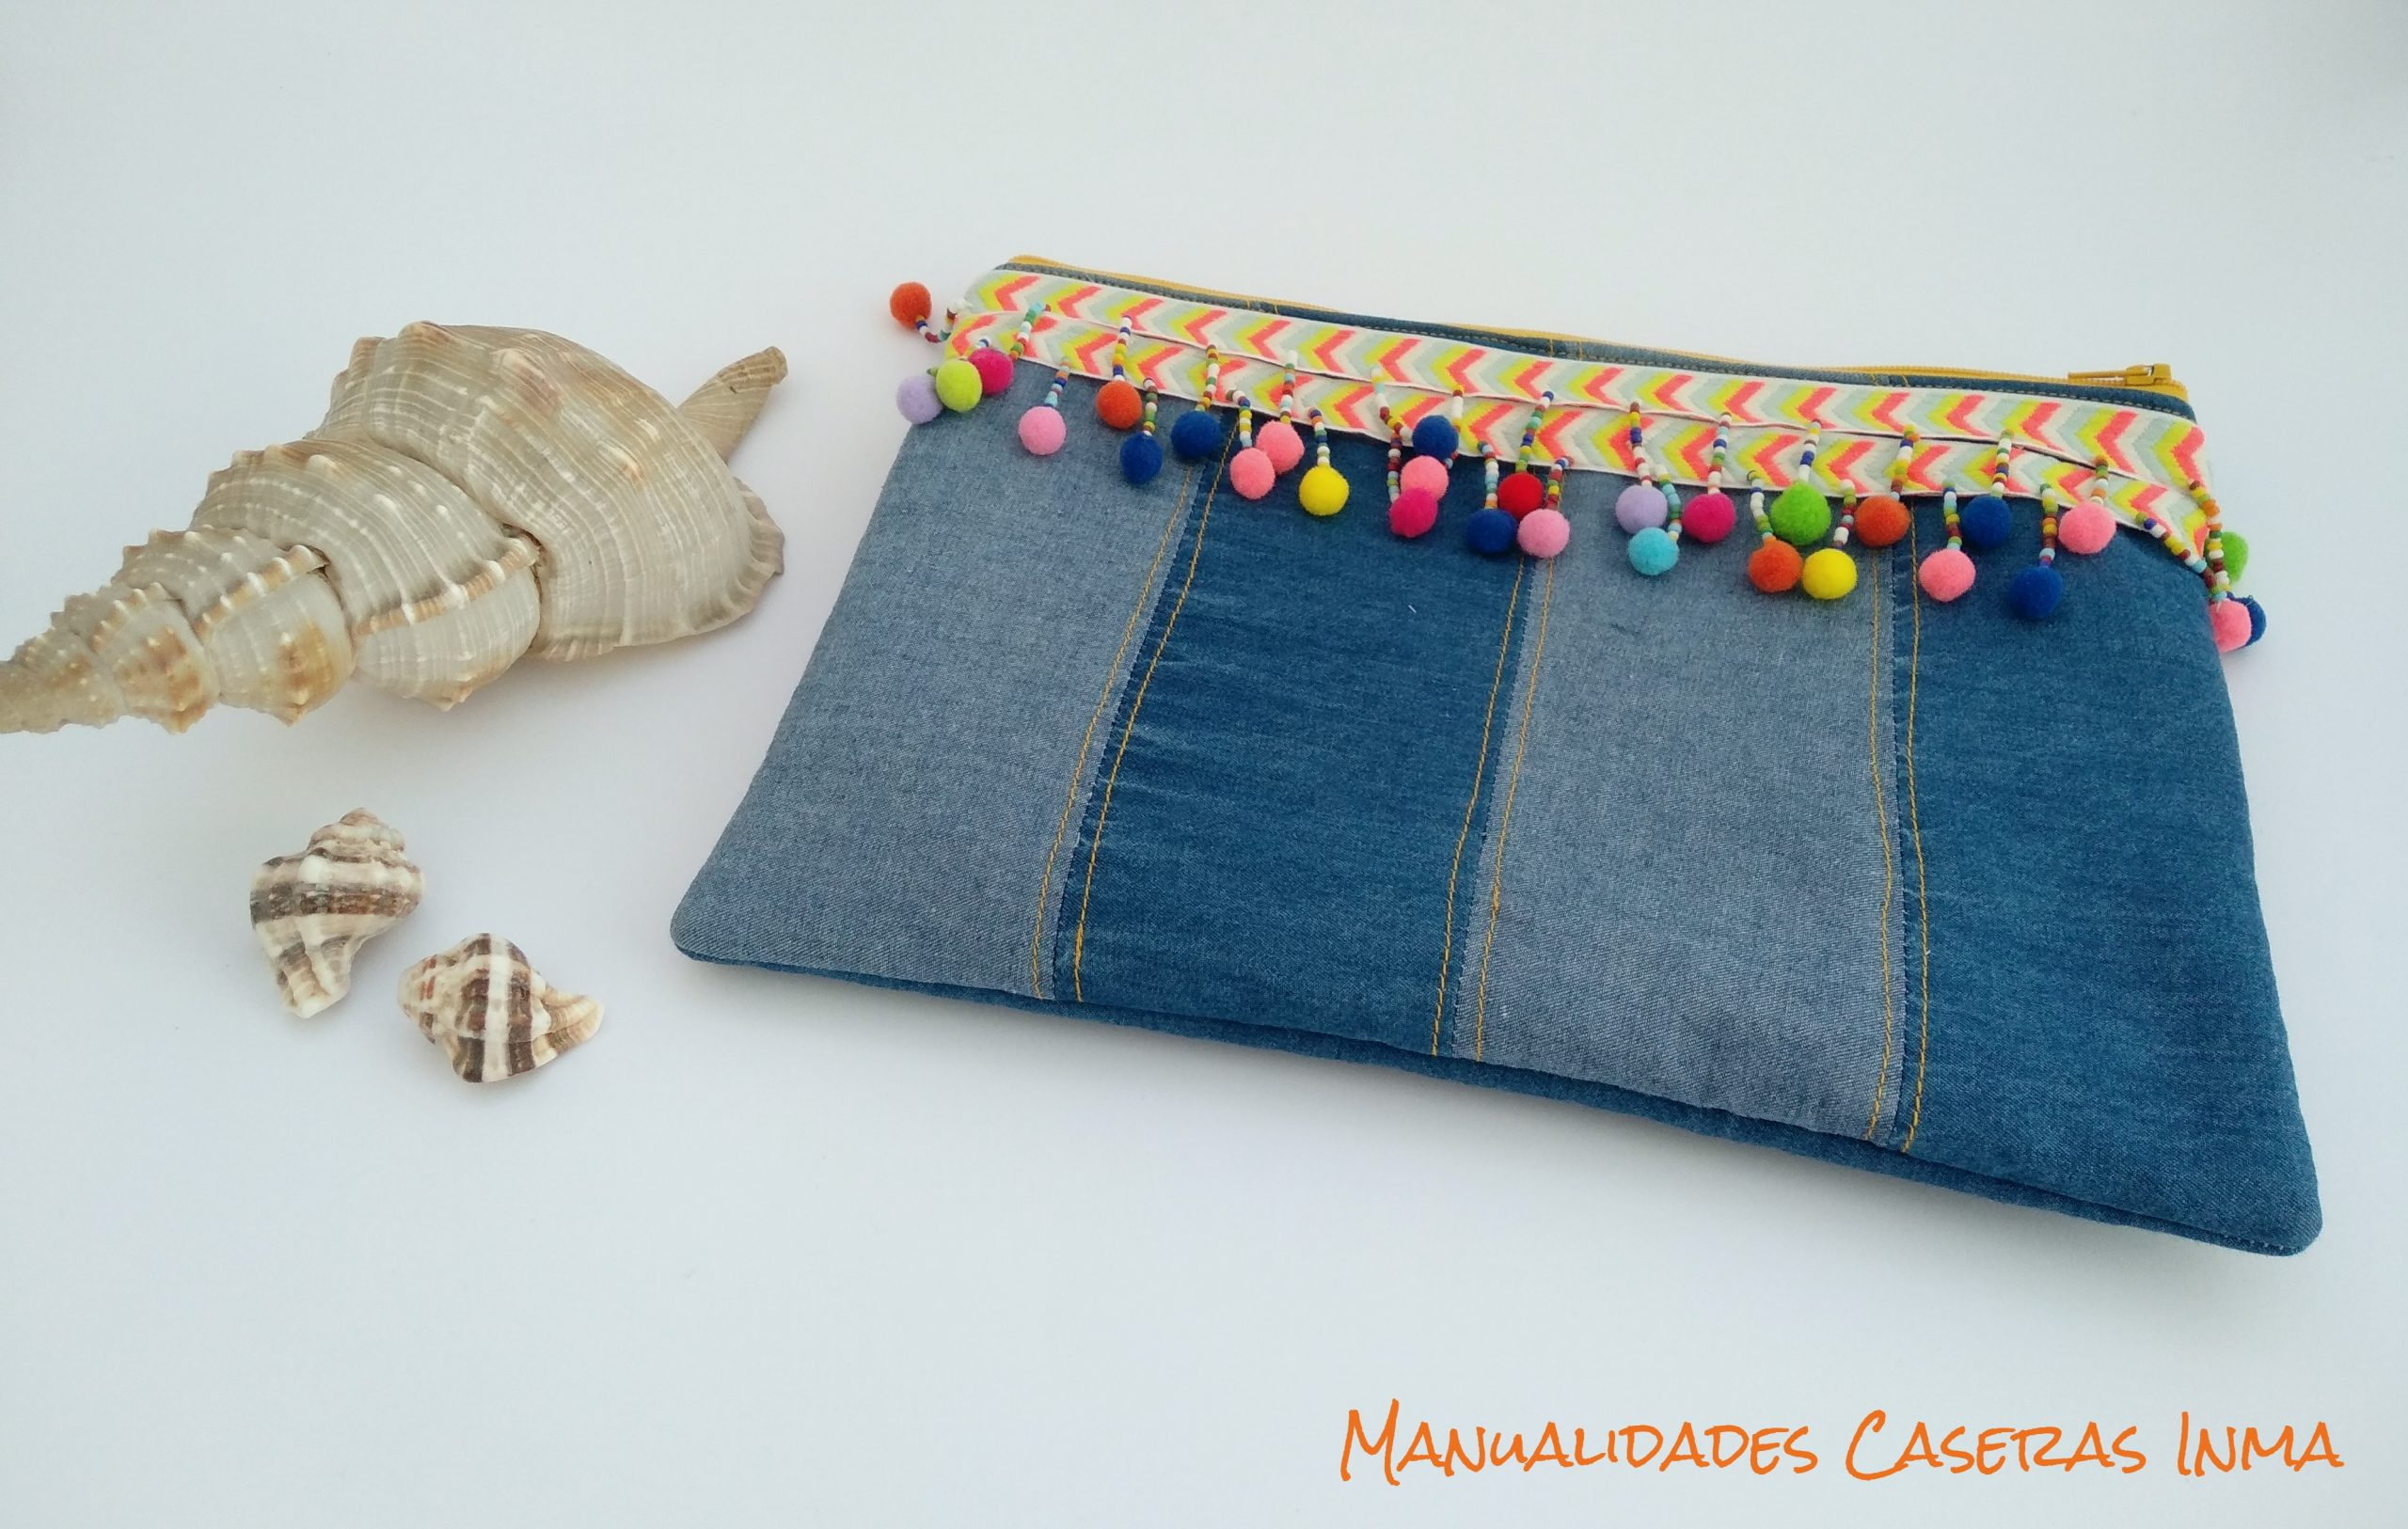 Manualidades Caseras Inma_ Bolso vaquero de mano con borlas